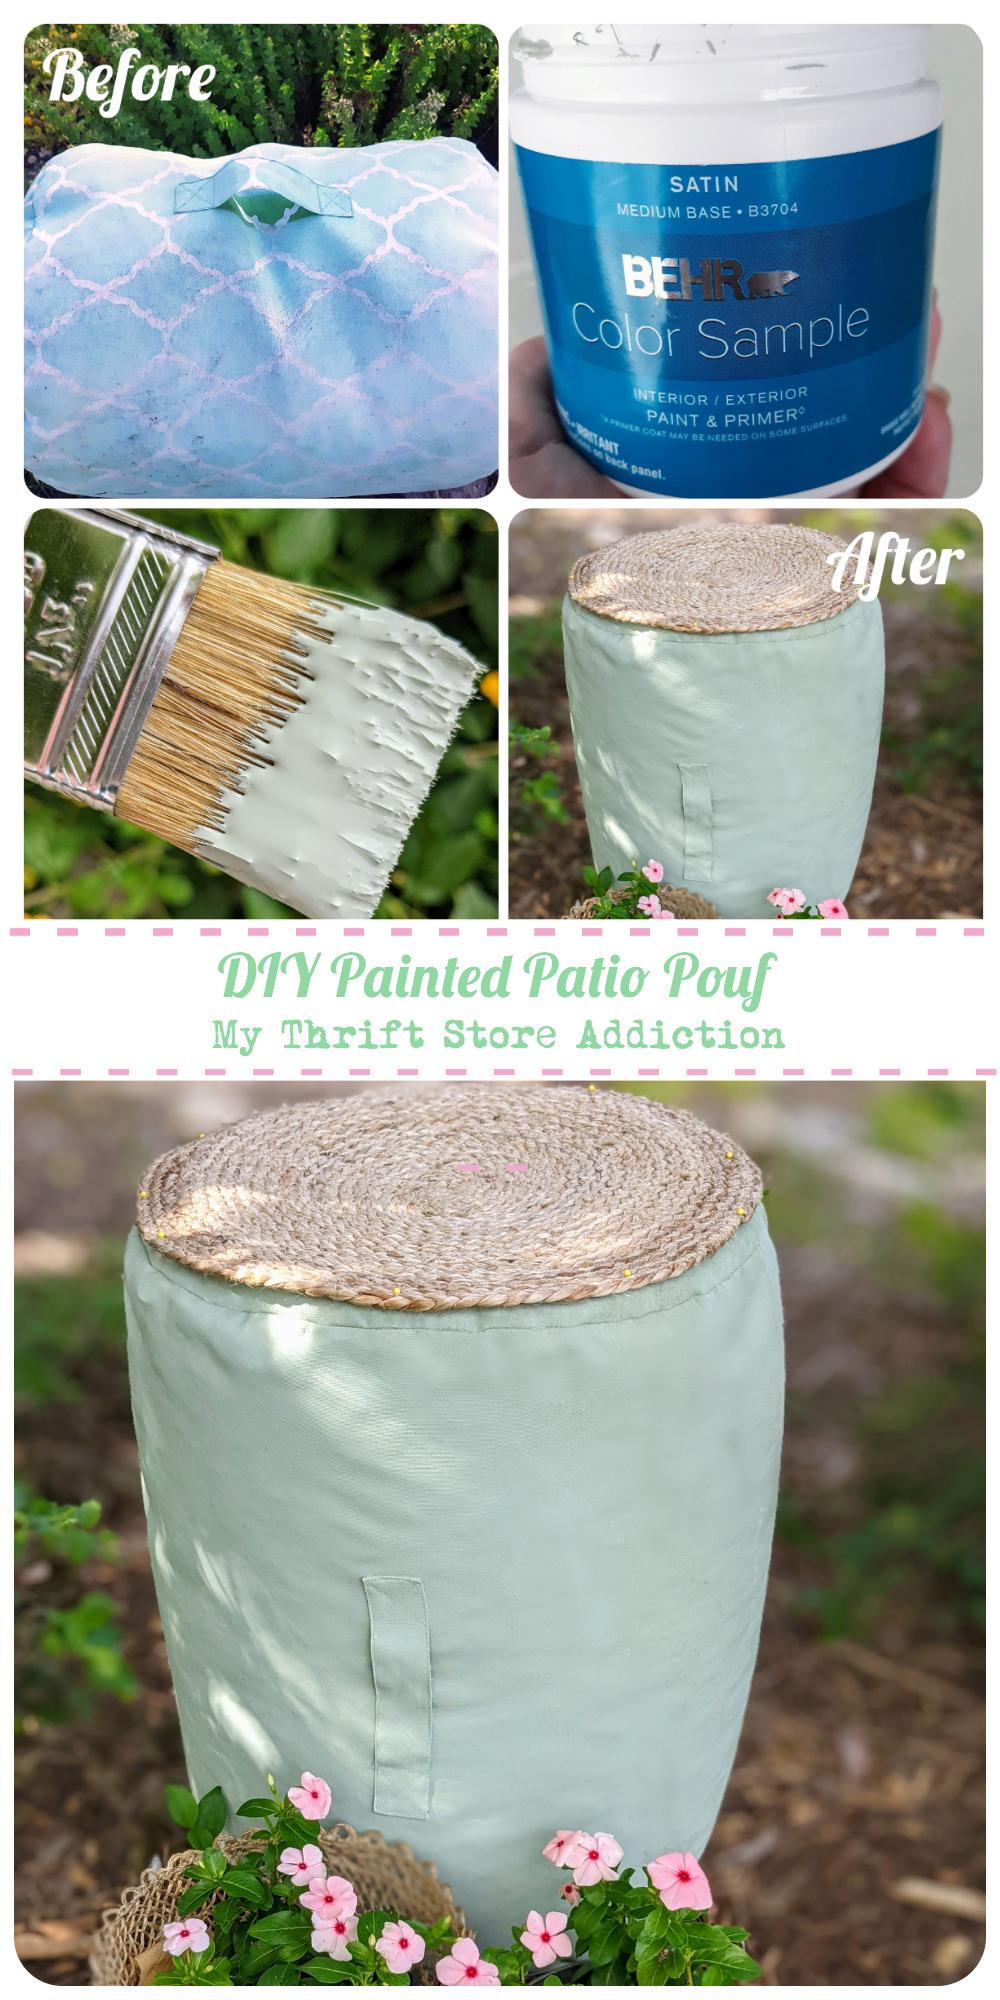 DIY painted patio pouf